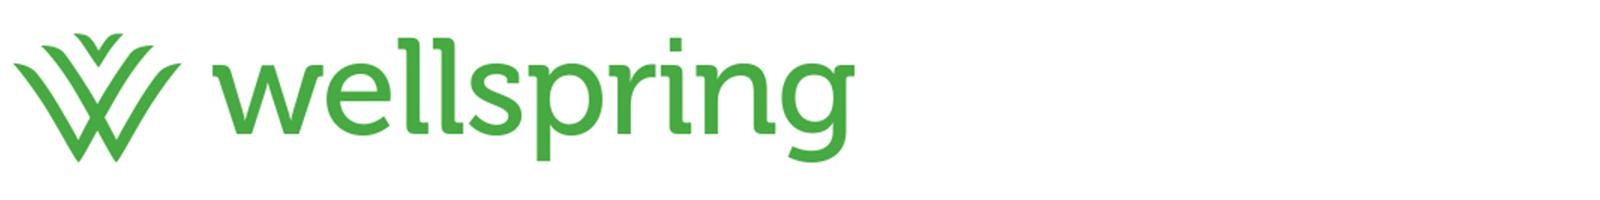 TCC_wellspring